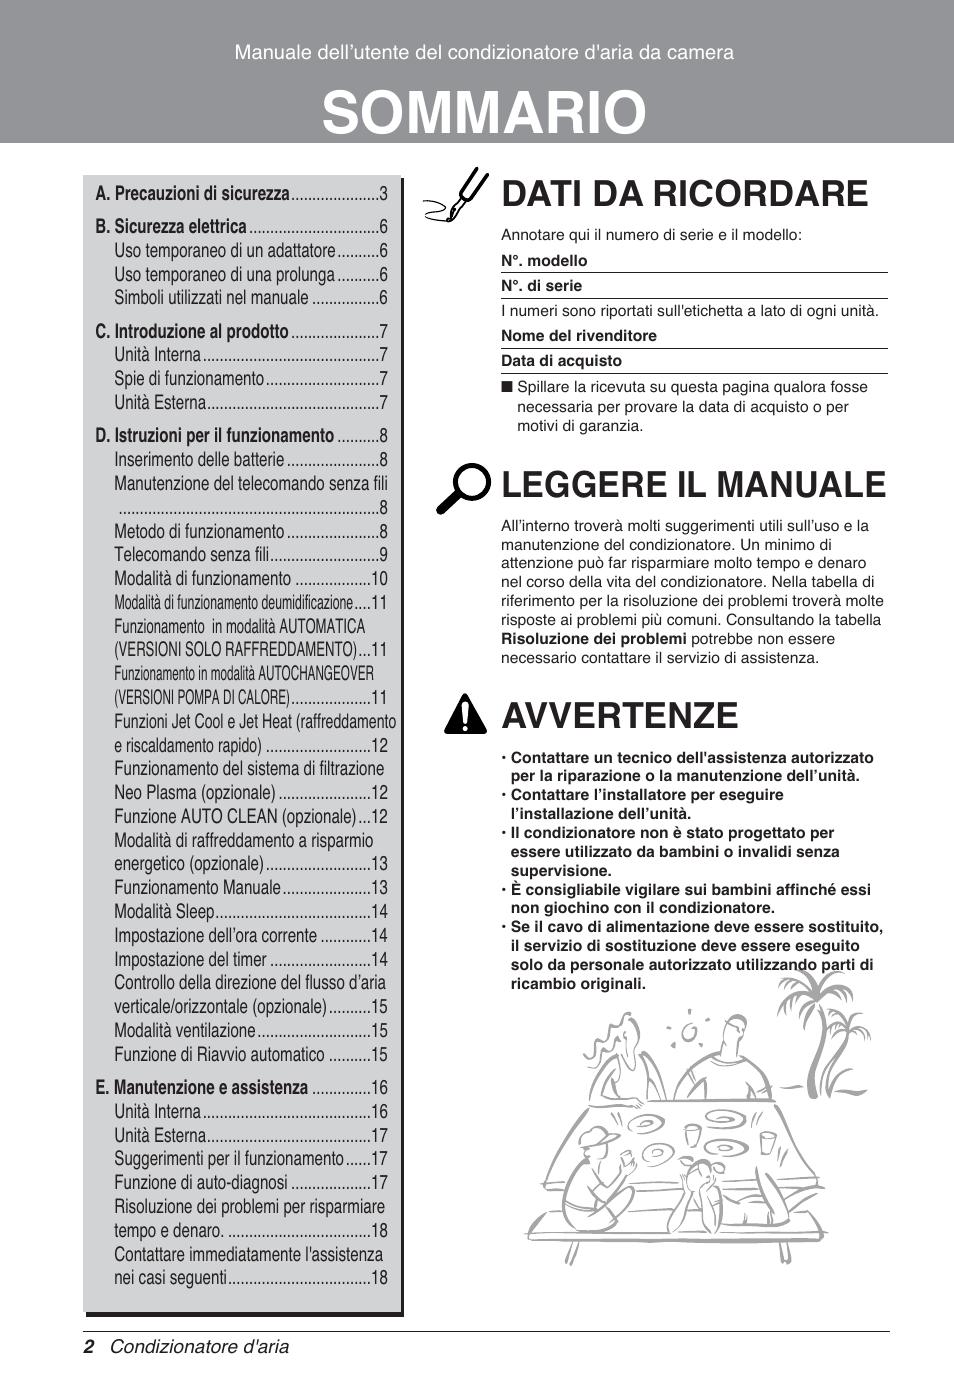 Lg K24ah N51 Manuale D Uso Pagina 2 18 Anche Per